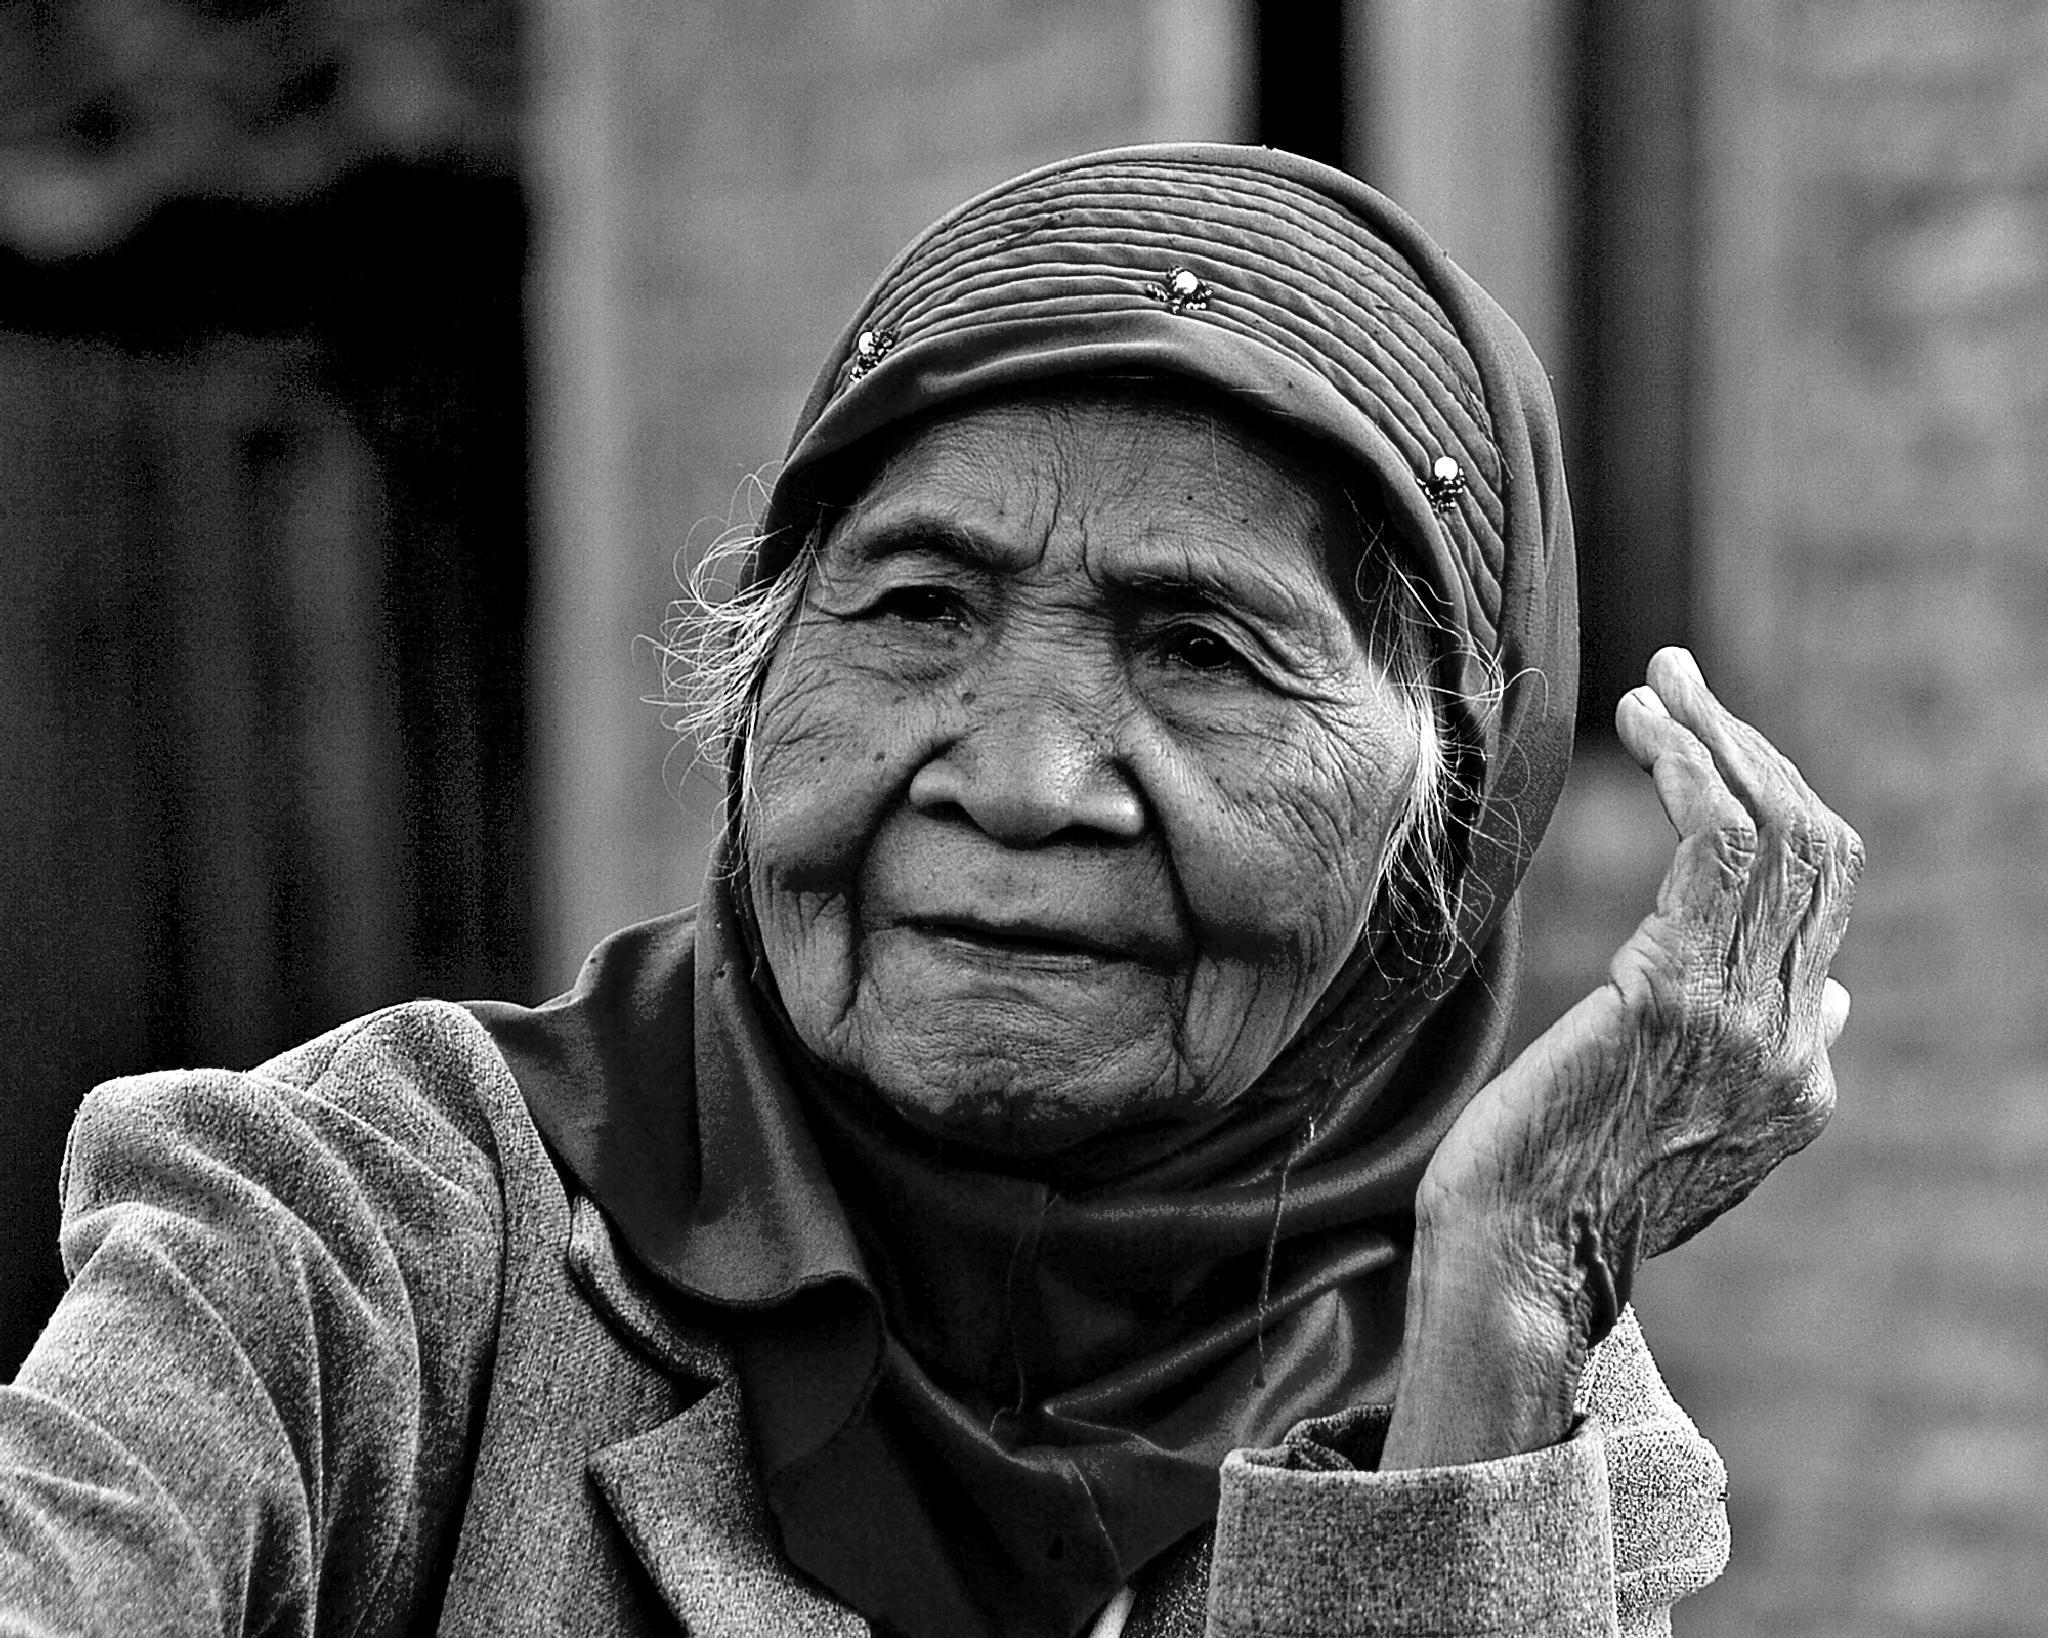 Old woman portrait by Sigit Purnomo